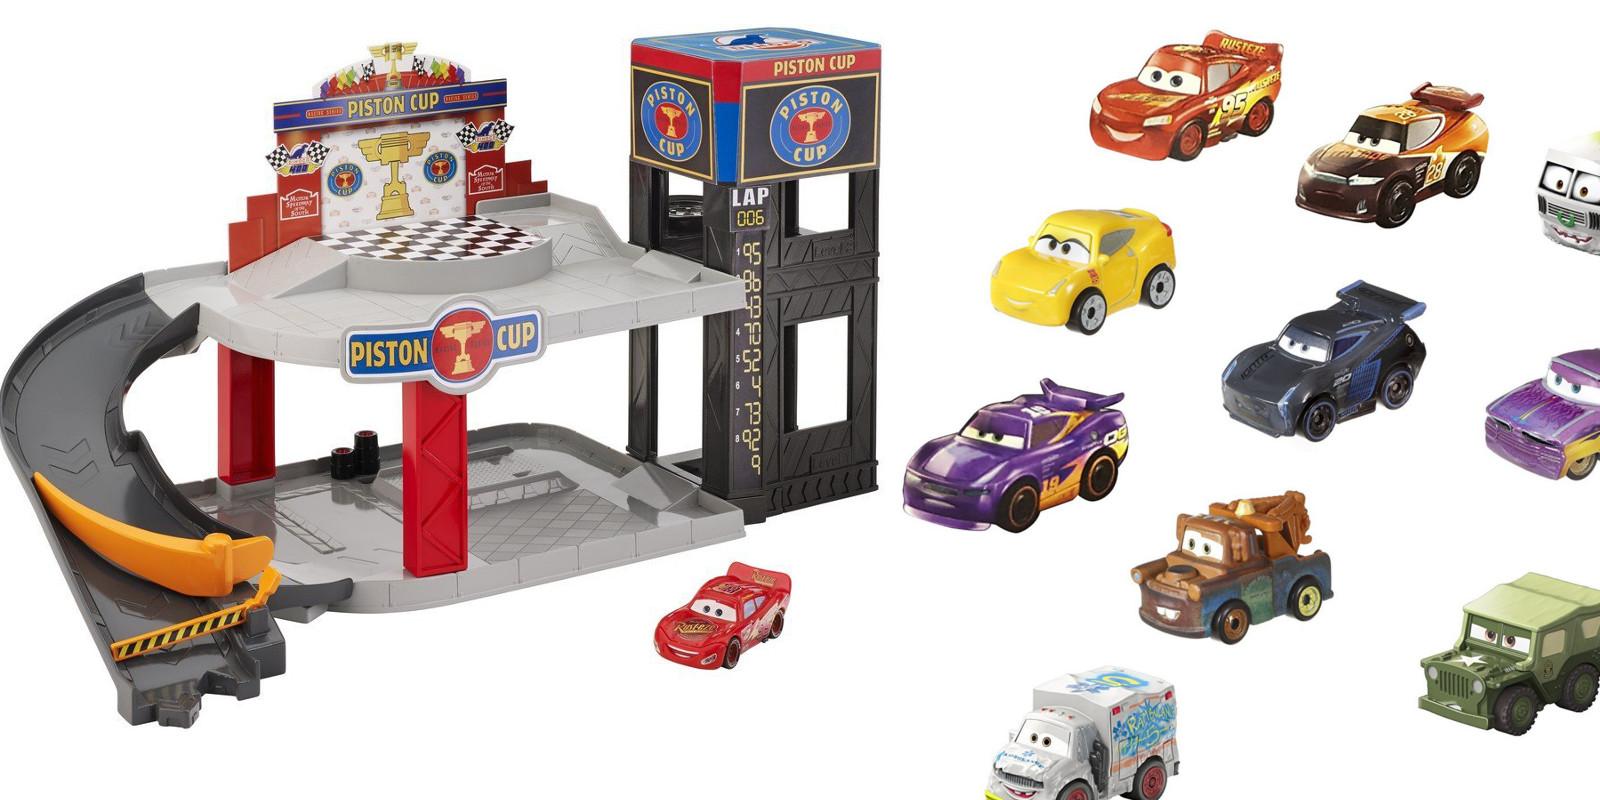 Amazon Disney Cars 3 Toys Sale 40 Off Piston Cup Racing Garage 12